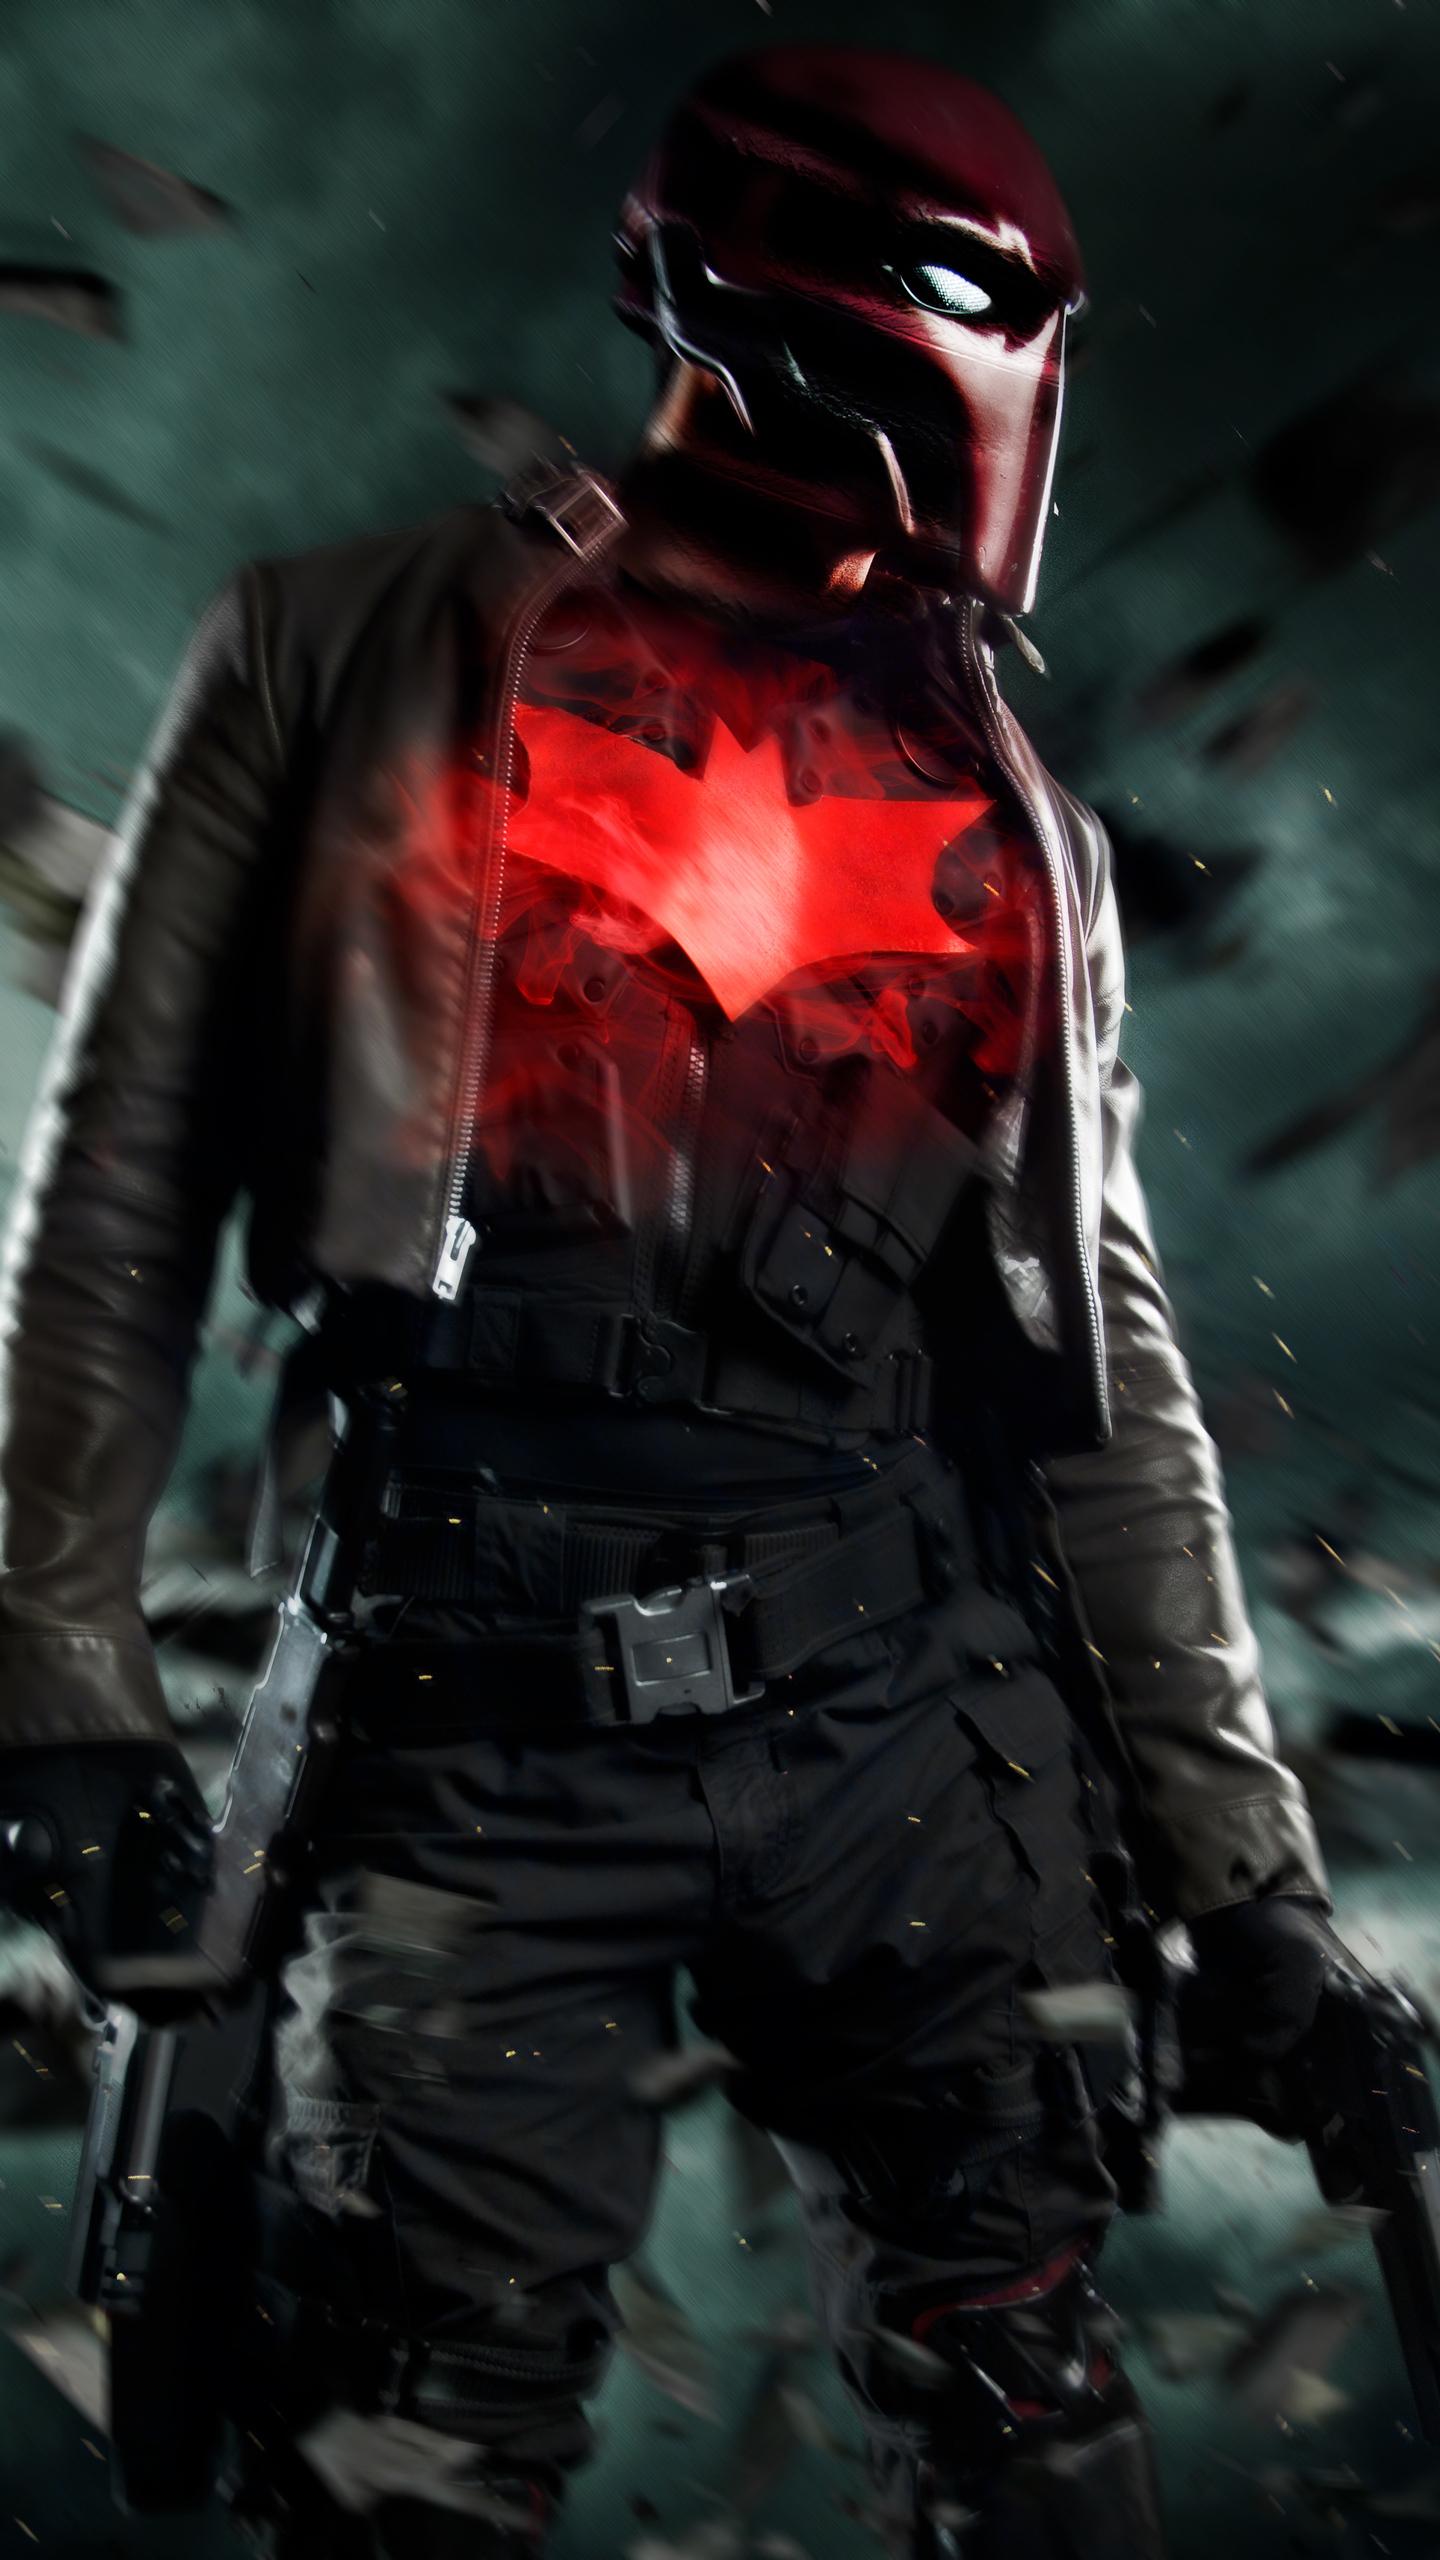 redhood-cosplay-4k-2019-5v.jpg